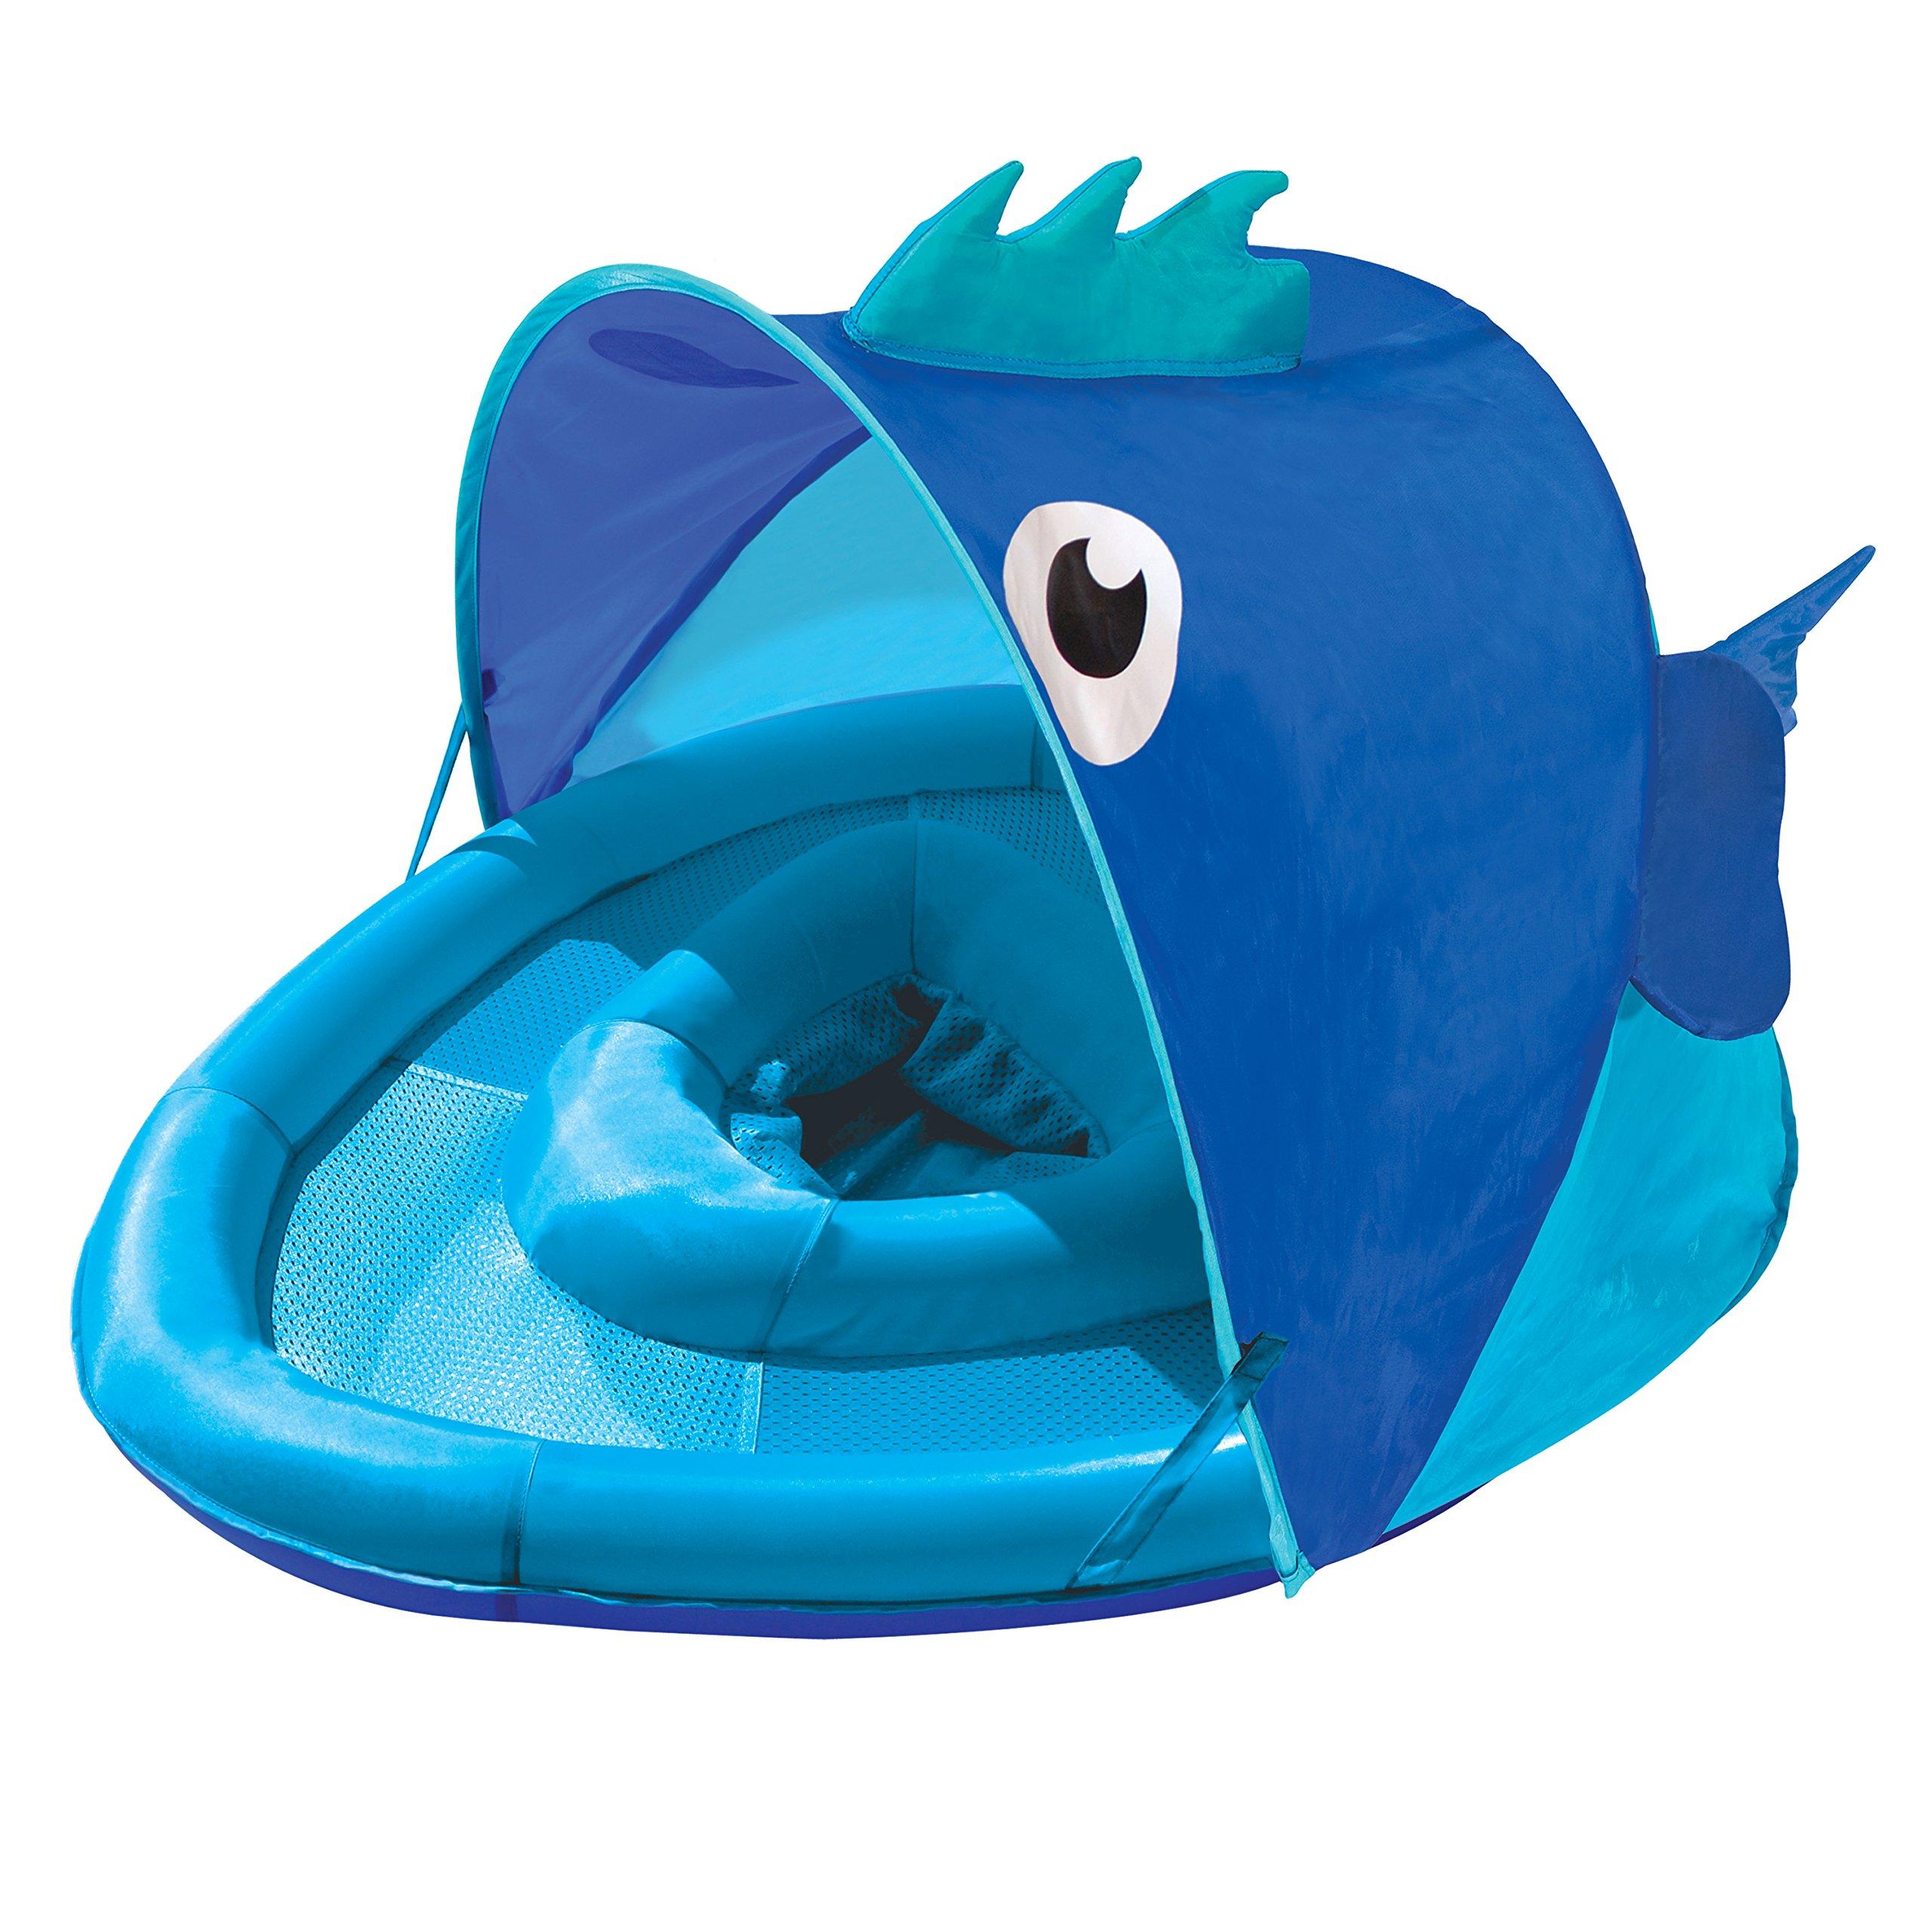 Swim School Confidence Building System Fish Sun Shade Baby Float Blue Ebay